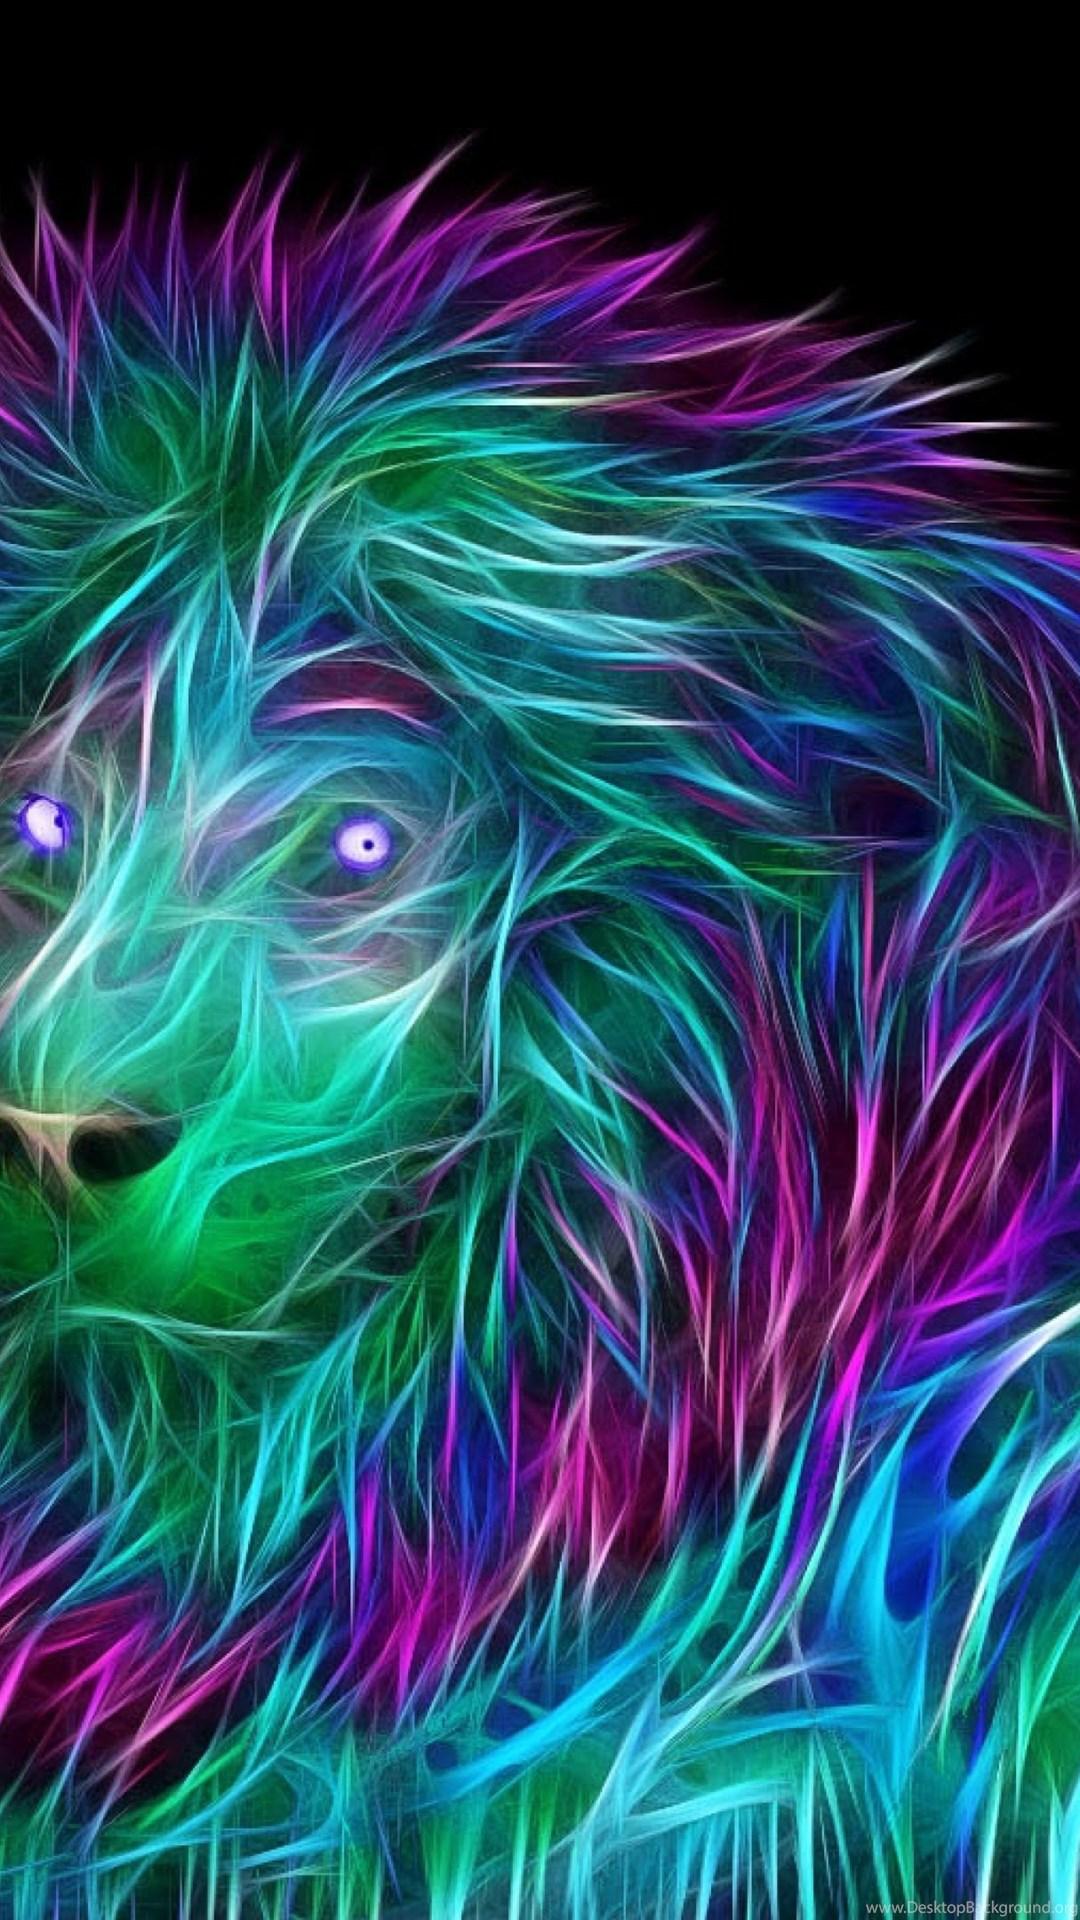 Download Wallpapers 3840x2160 Abstract 3d Art Lion 4k Ultra Hd Desktop Background